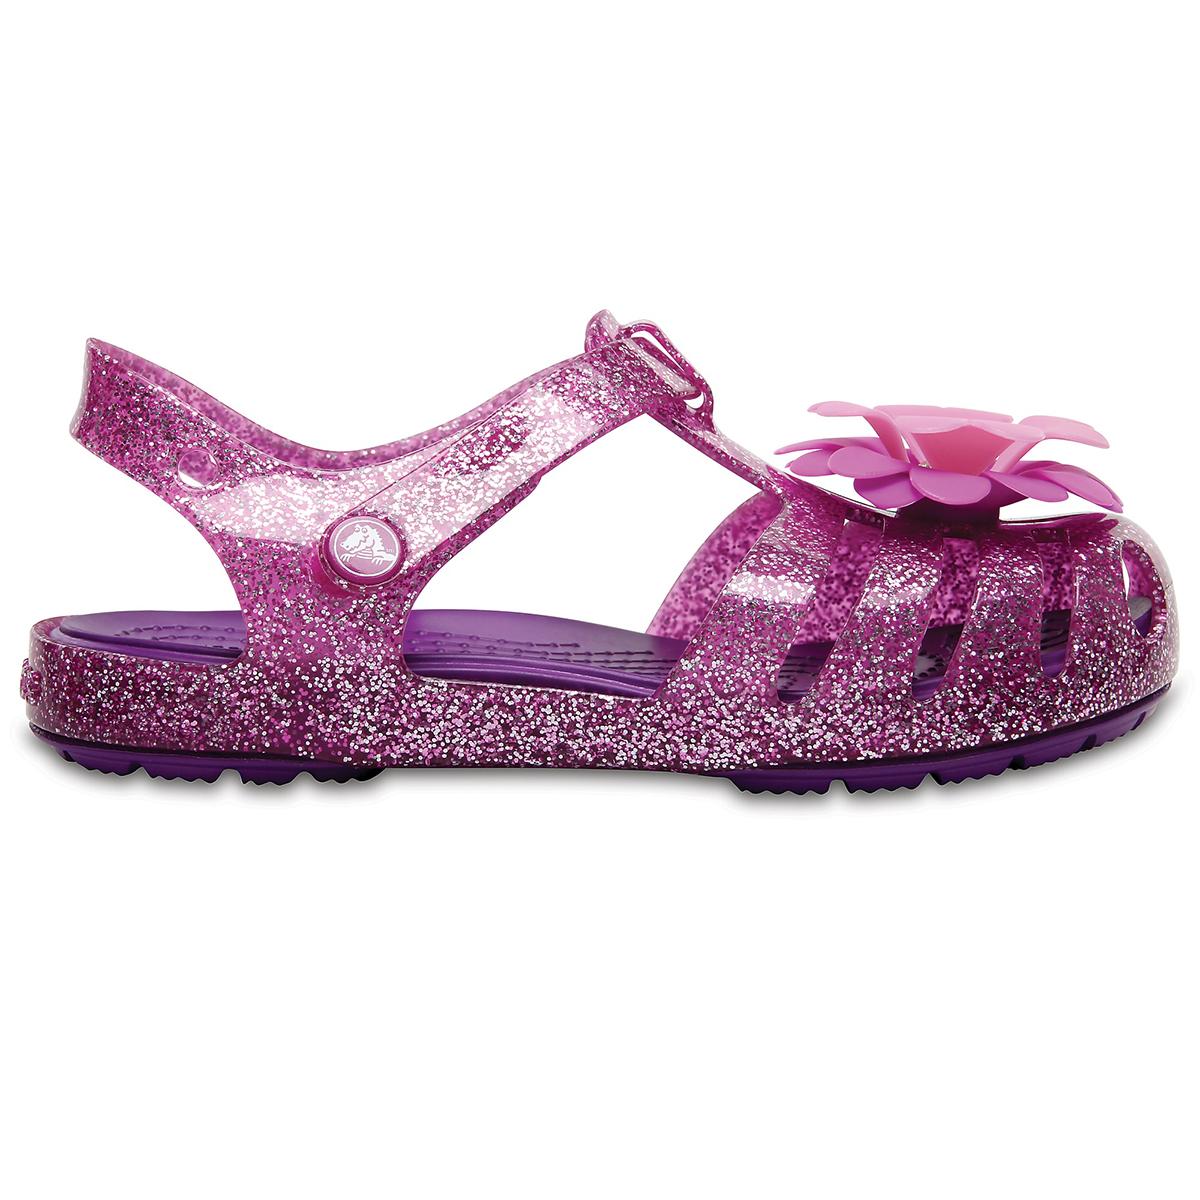 CrocsIsabella Novelty Sandal K-Canlı Menekşe